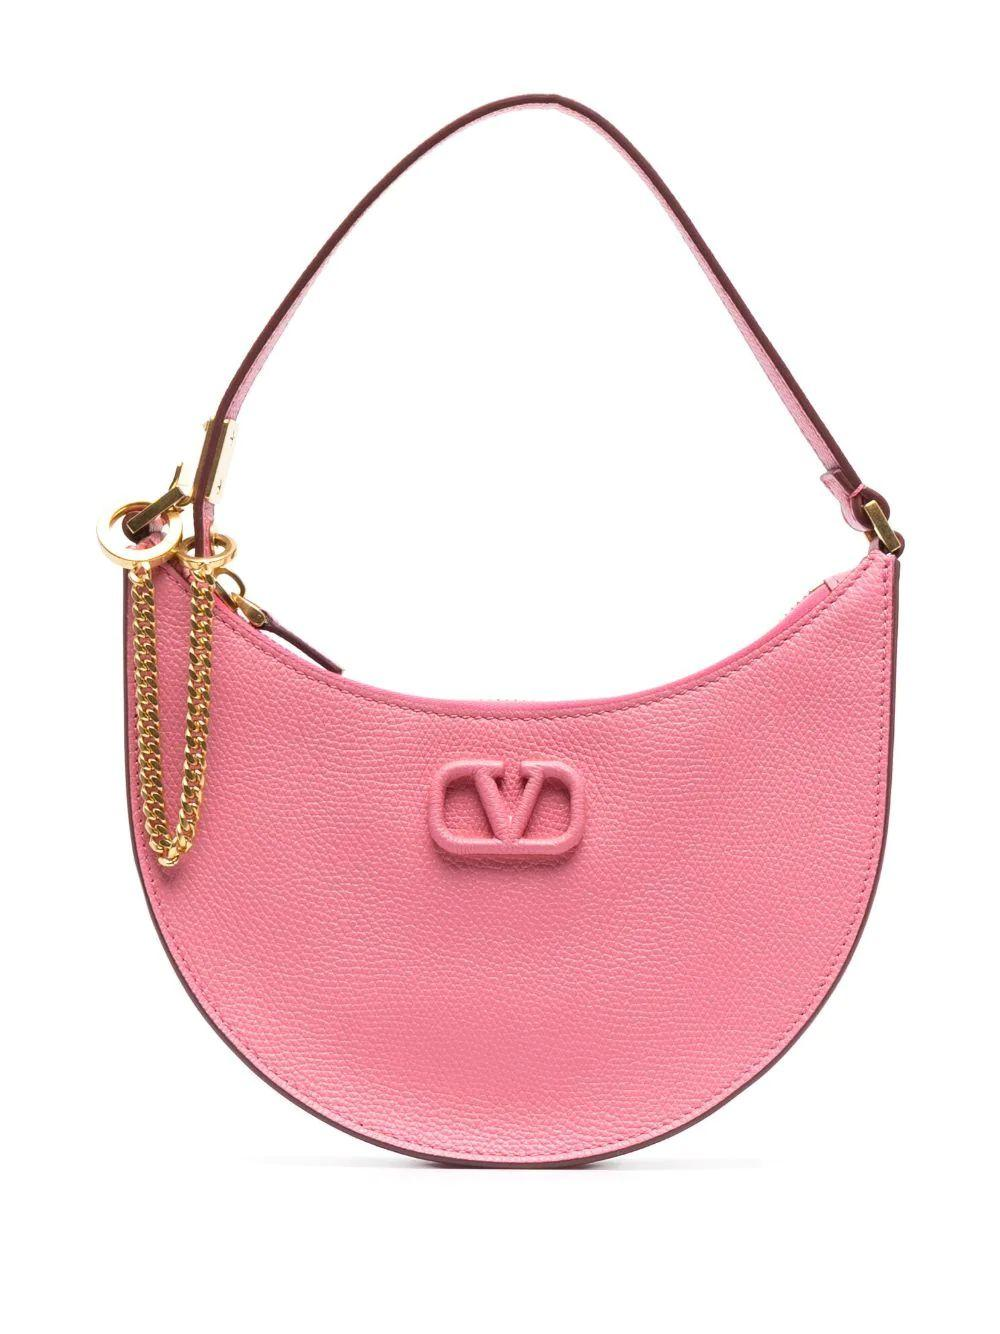 Vsling Mini Hobo Bag Item # VW0P0W19RQR